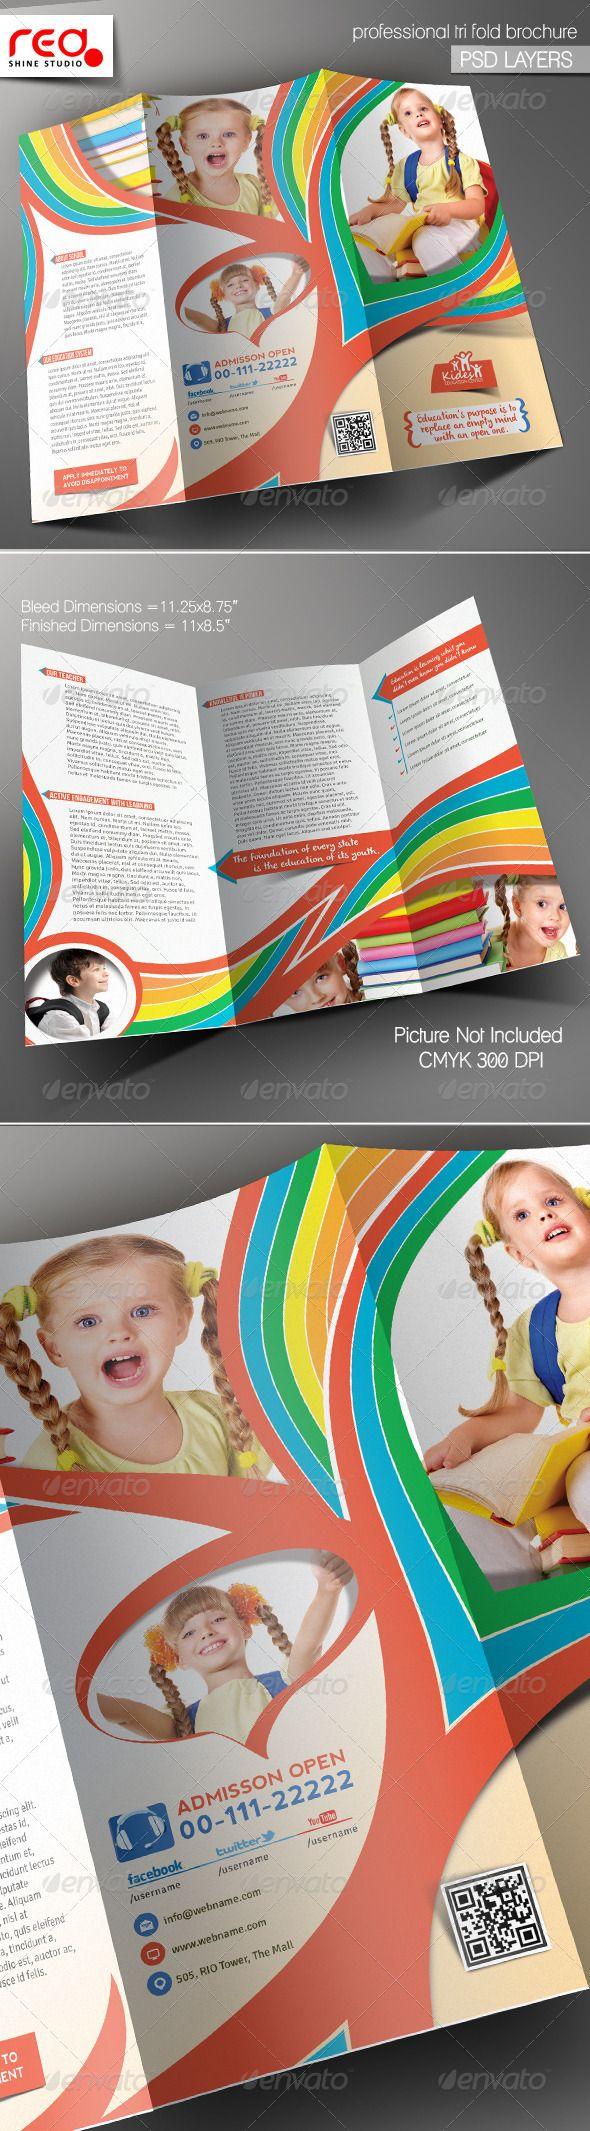 Kid's School Promotion Trifold Brochure Template